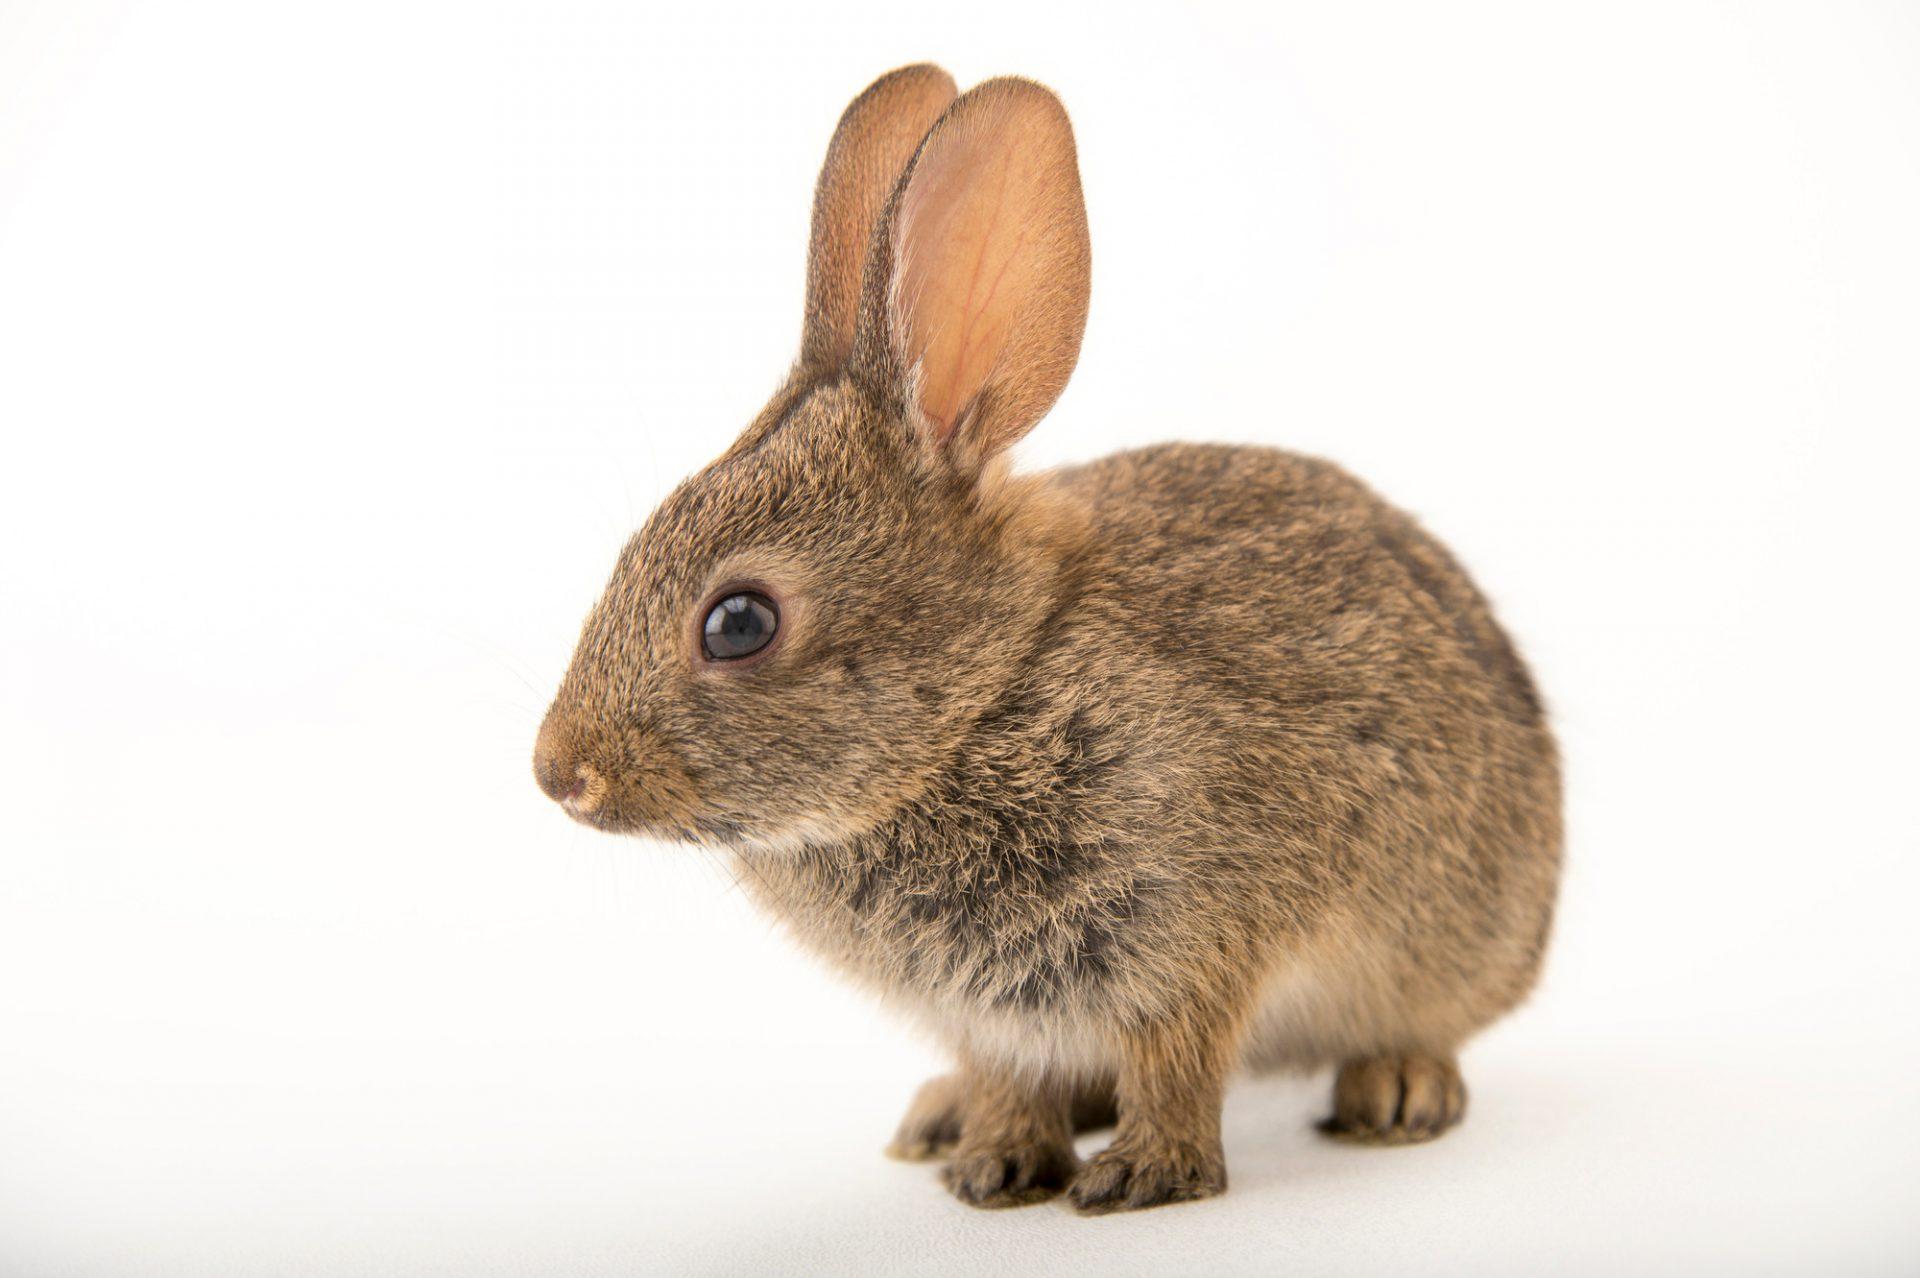 Picture of a juvenile western brush rabbit (Sylvilagus bachmani) at the Santa Barbara Wildlife Care Network.